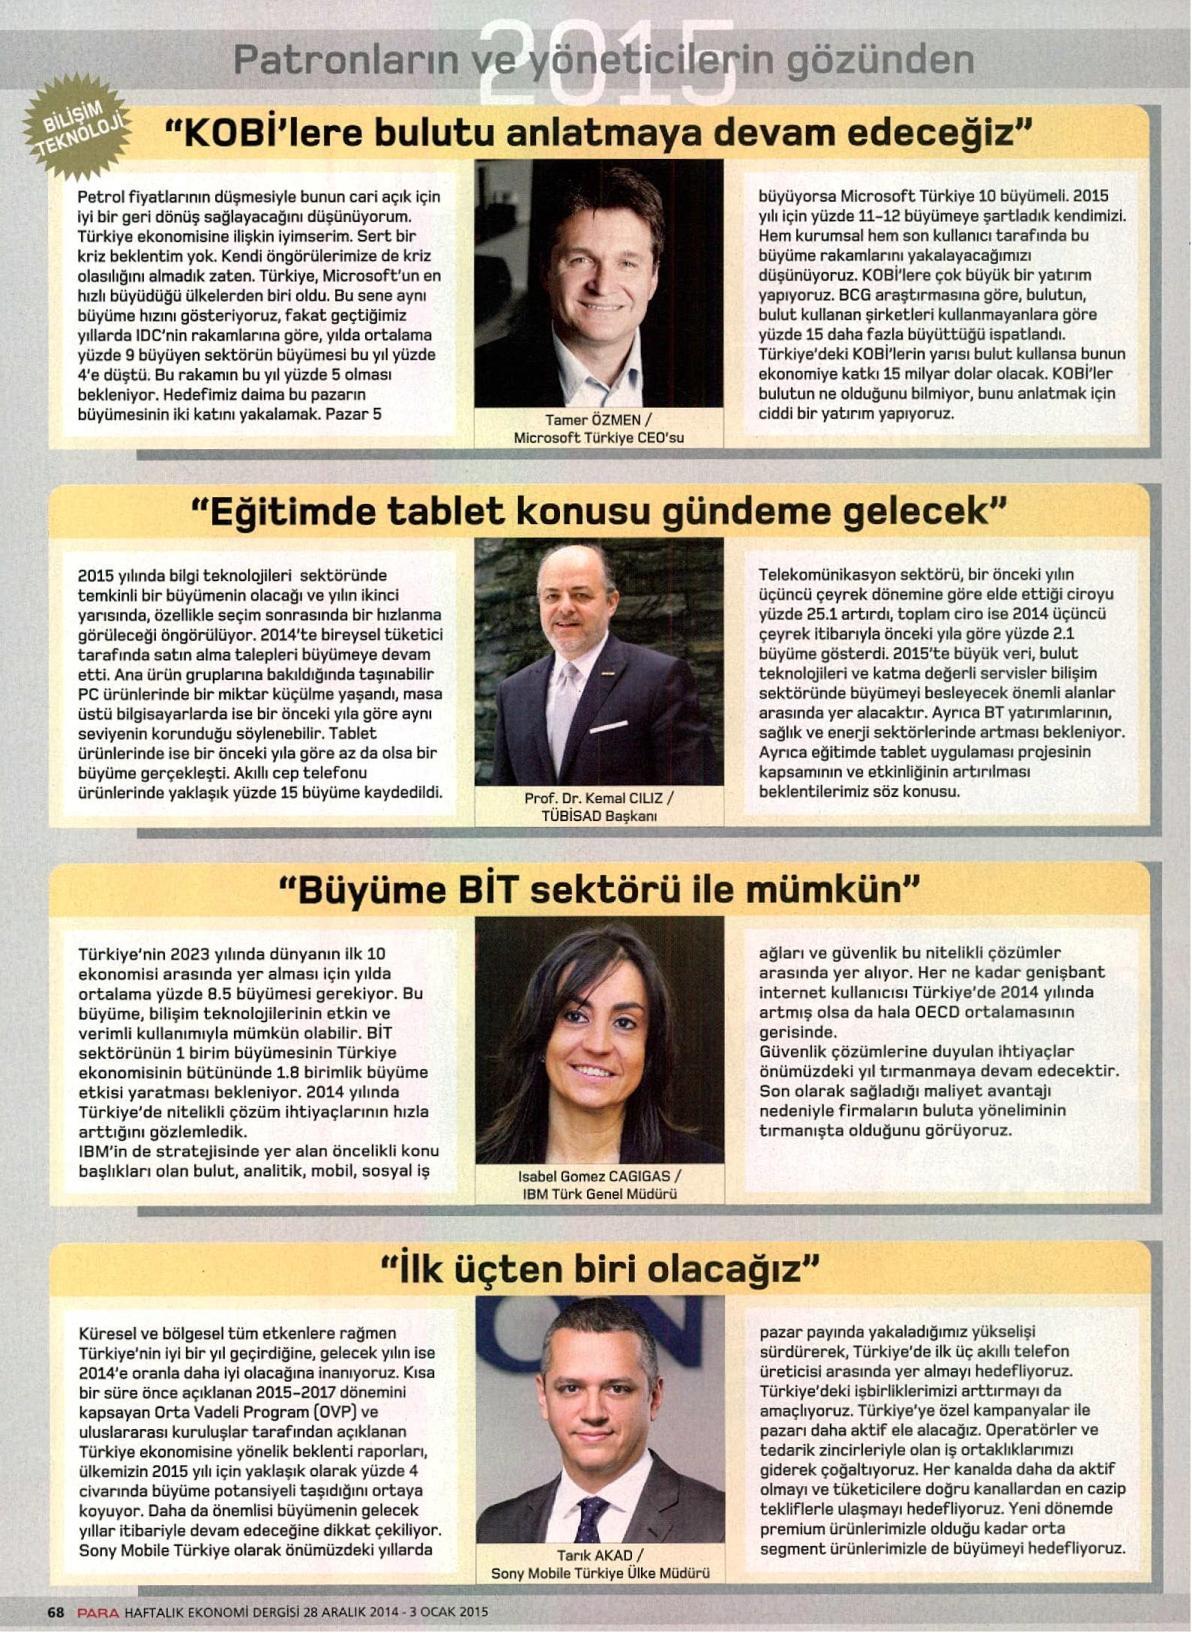 Netmarble-Turkey-Para-Sayfa-68-28.12.14